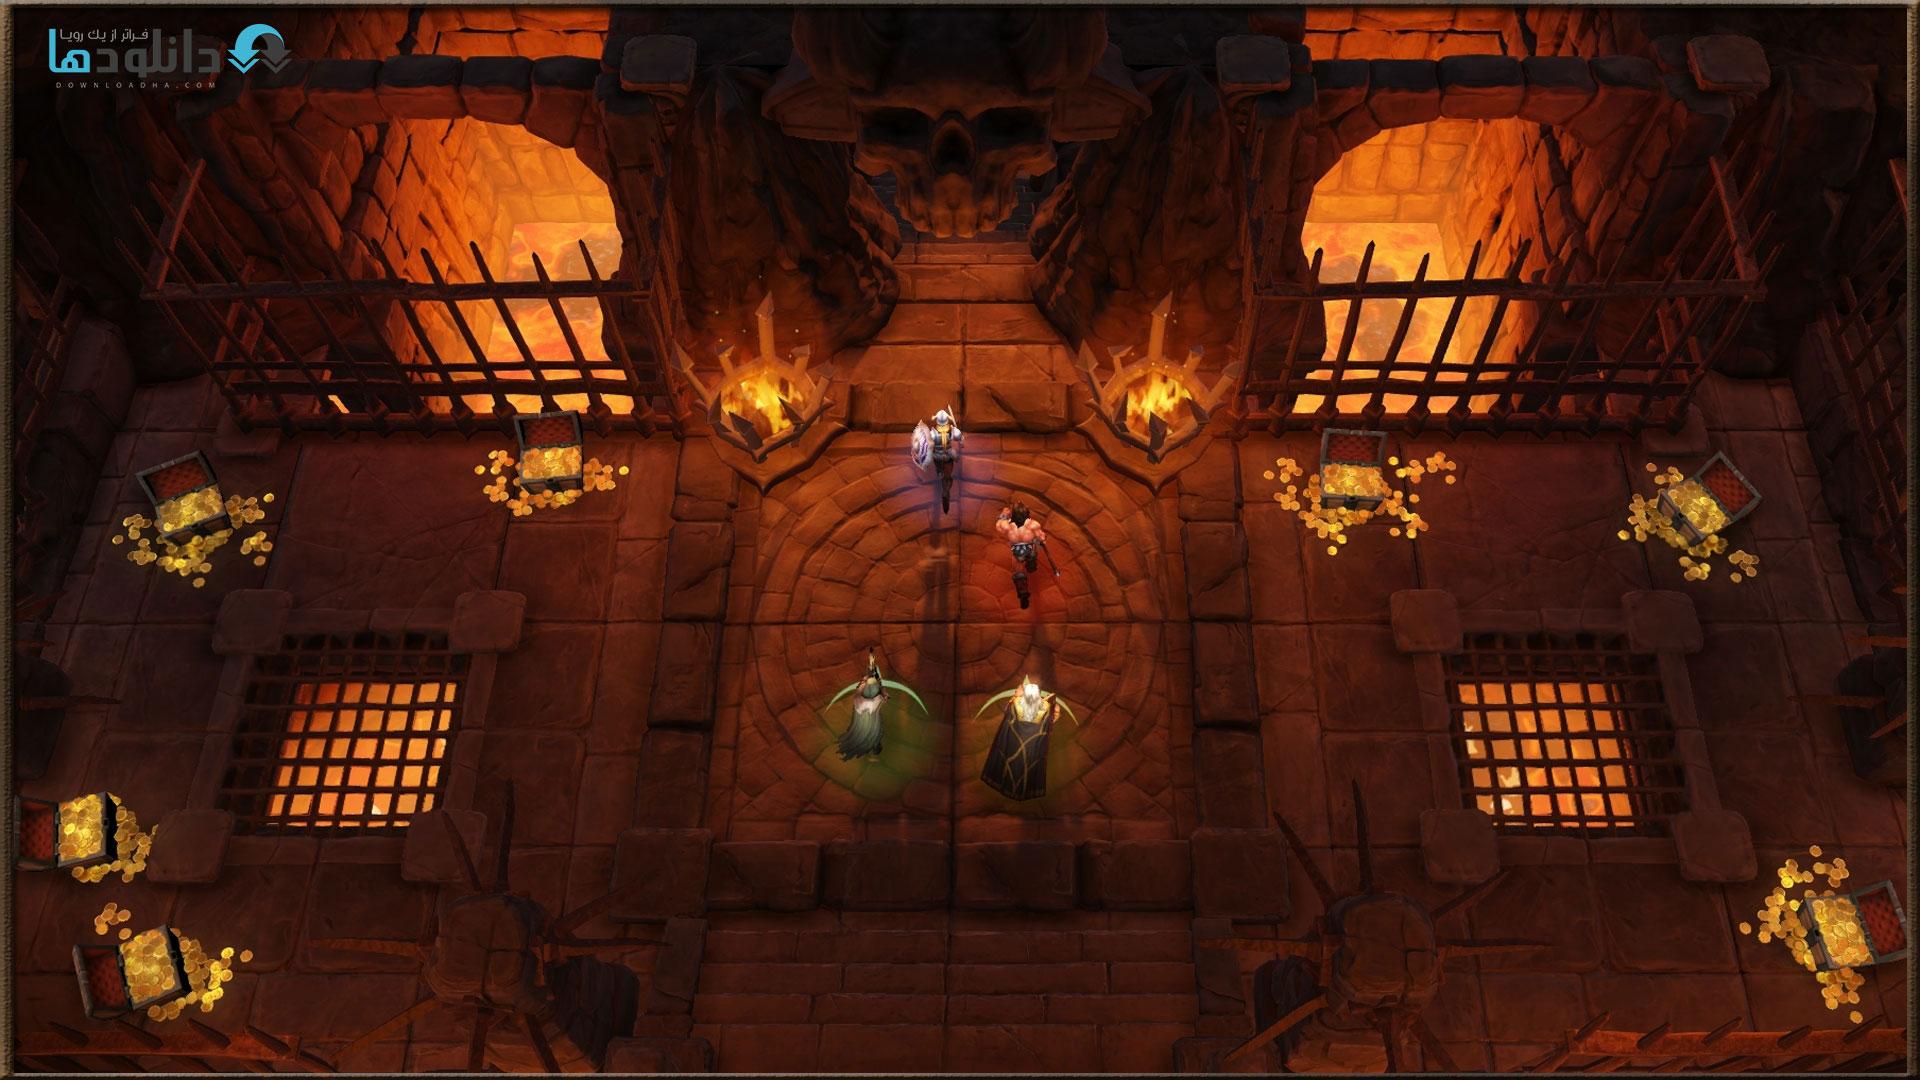 http://img5.downloadha.com/hosein/Game/September%202014/25/Gauntlet-screenshots-05-large.jpg